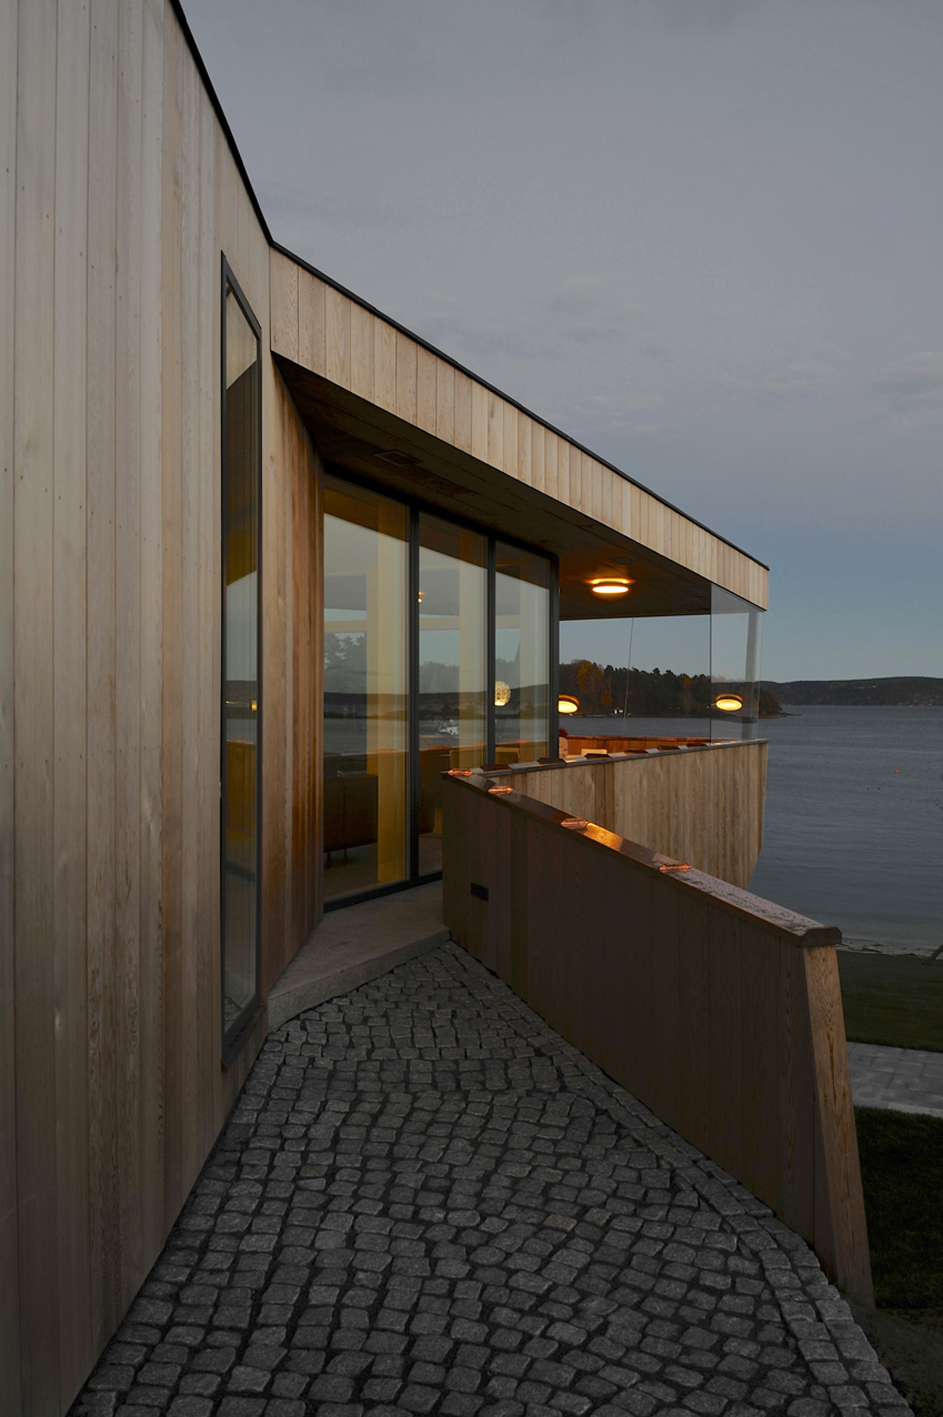 533b8686c07a807cd500007e_casa-dividida-jva_splithouse_exterior_04_outside_gallery